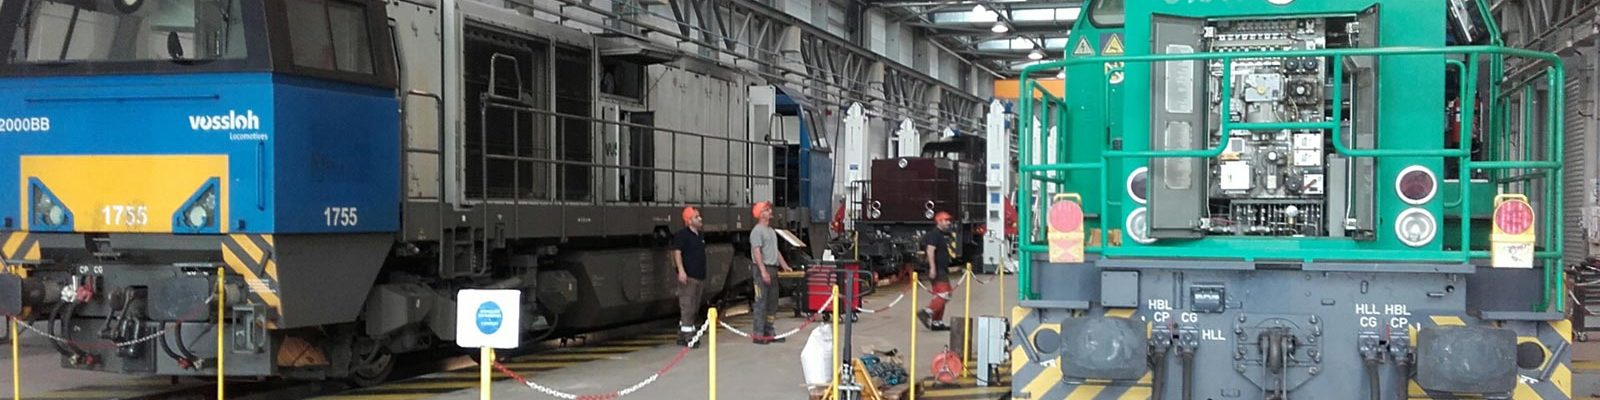 remotorisation loco